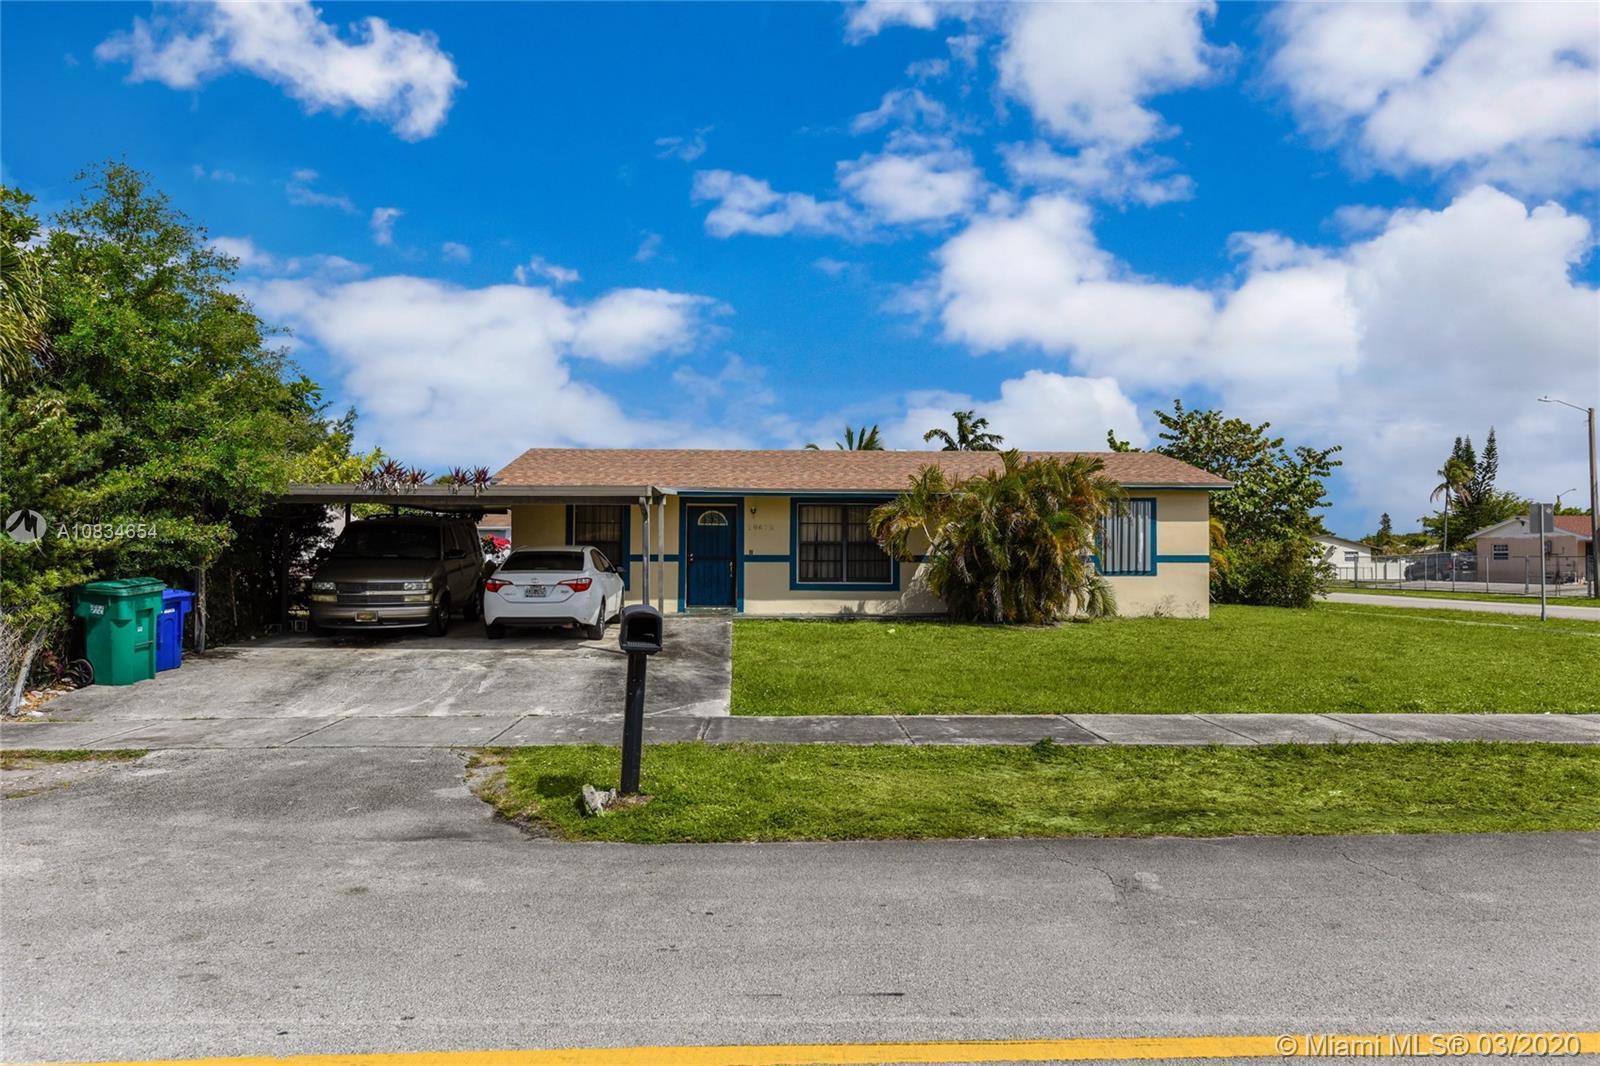 19675 NW 32nd Ct, Miami Gardens, FL 33056 - Miami Gardens, FL real estate listing